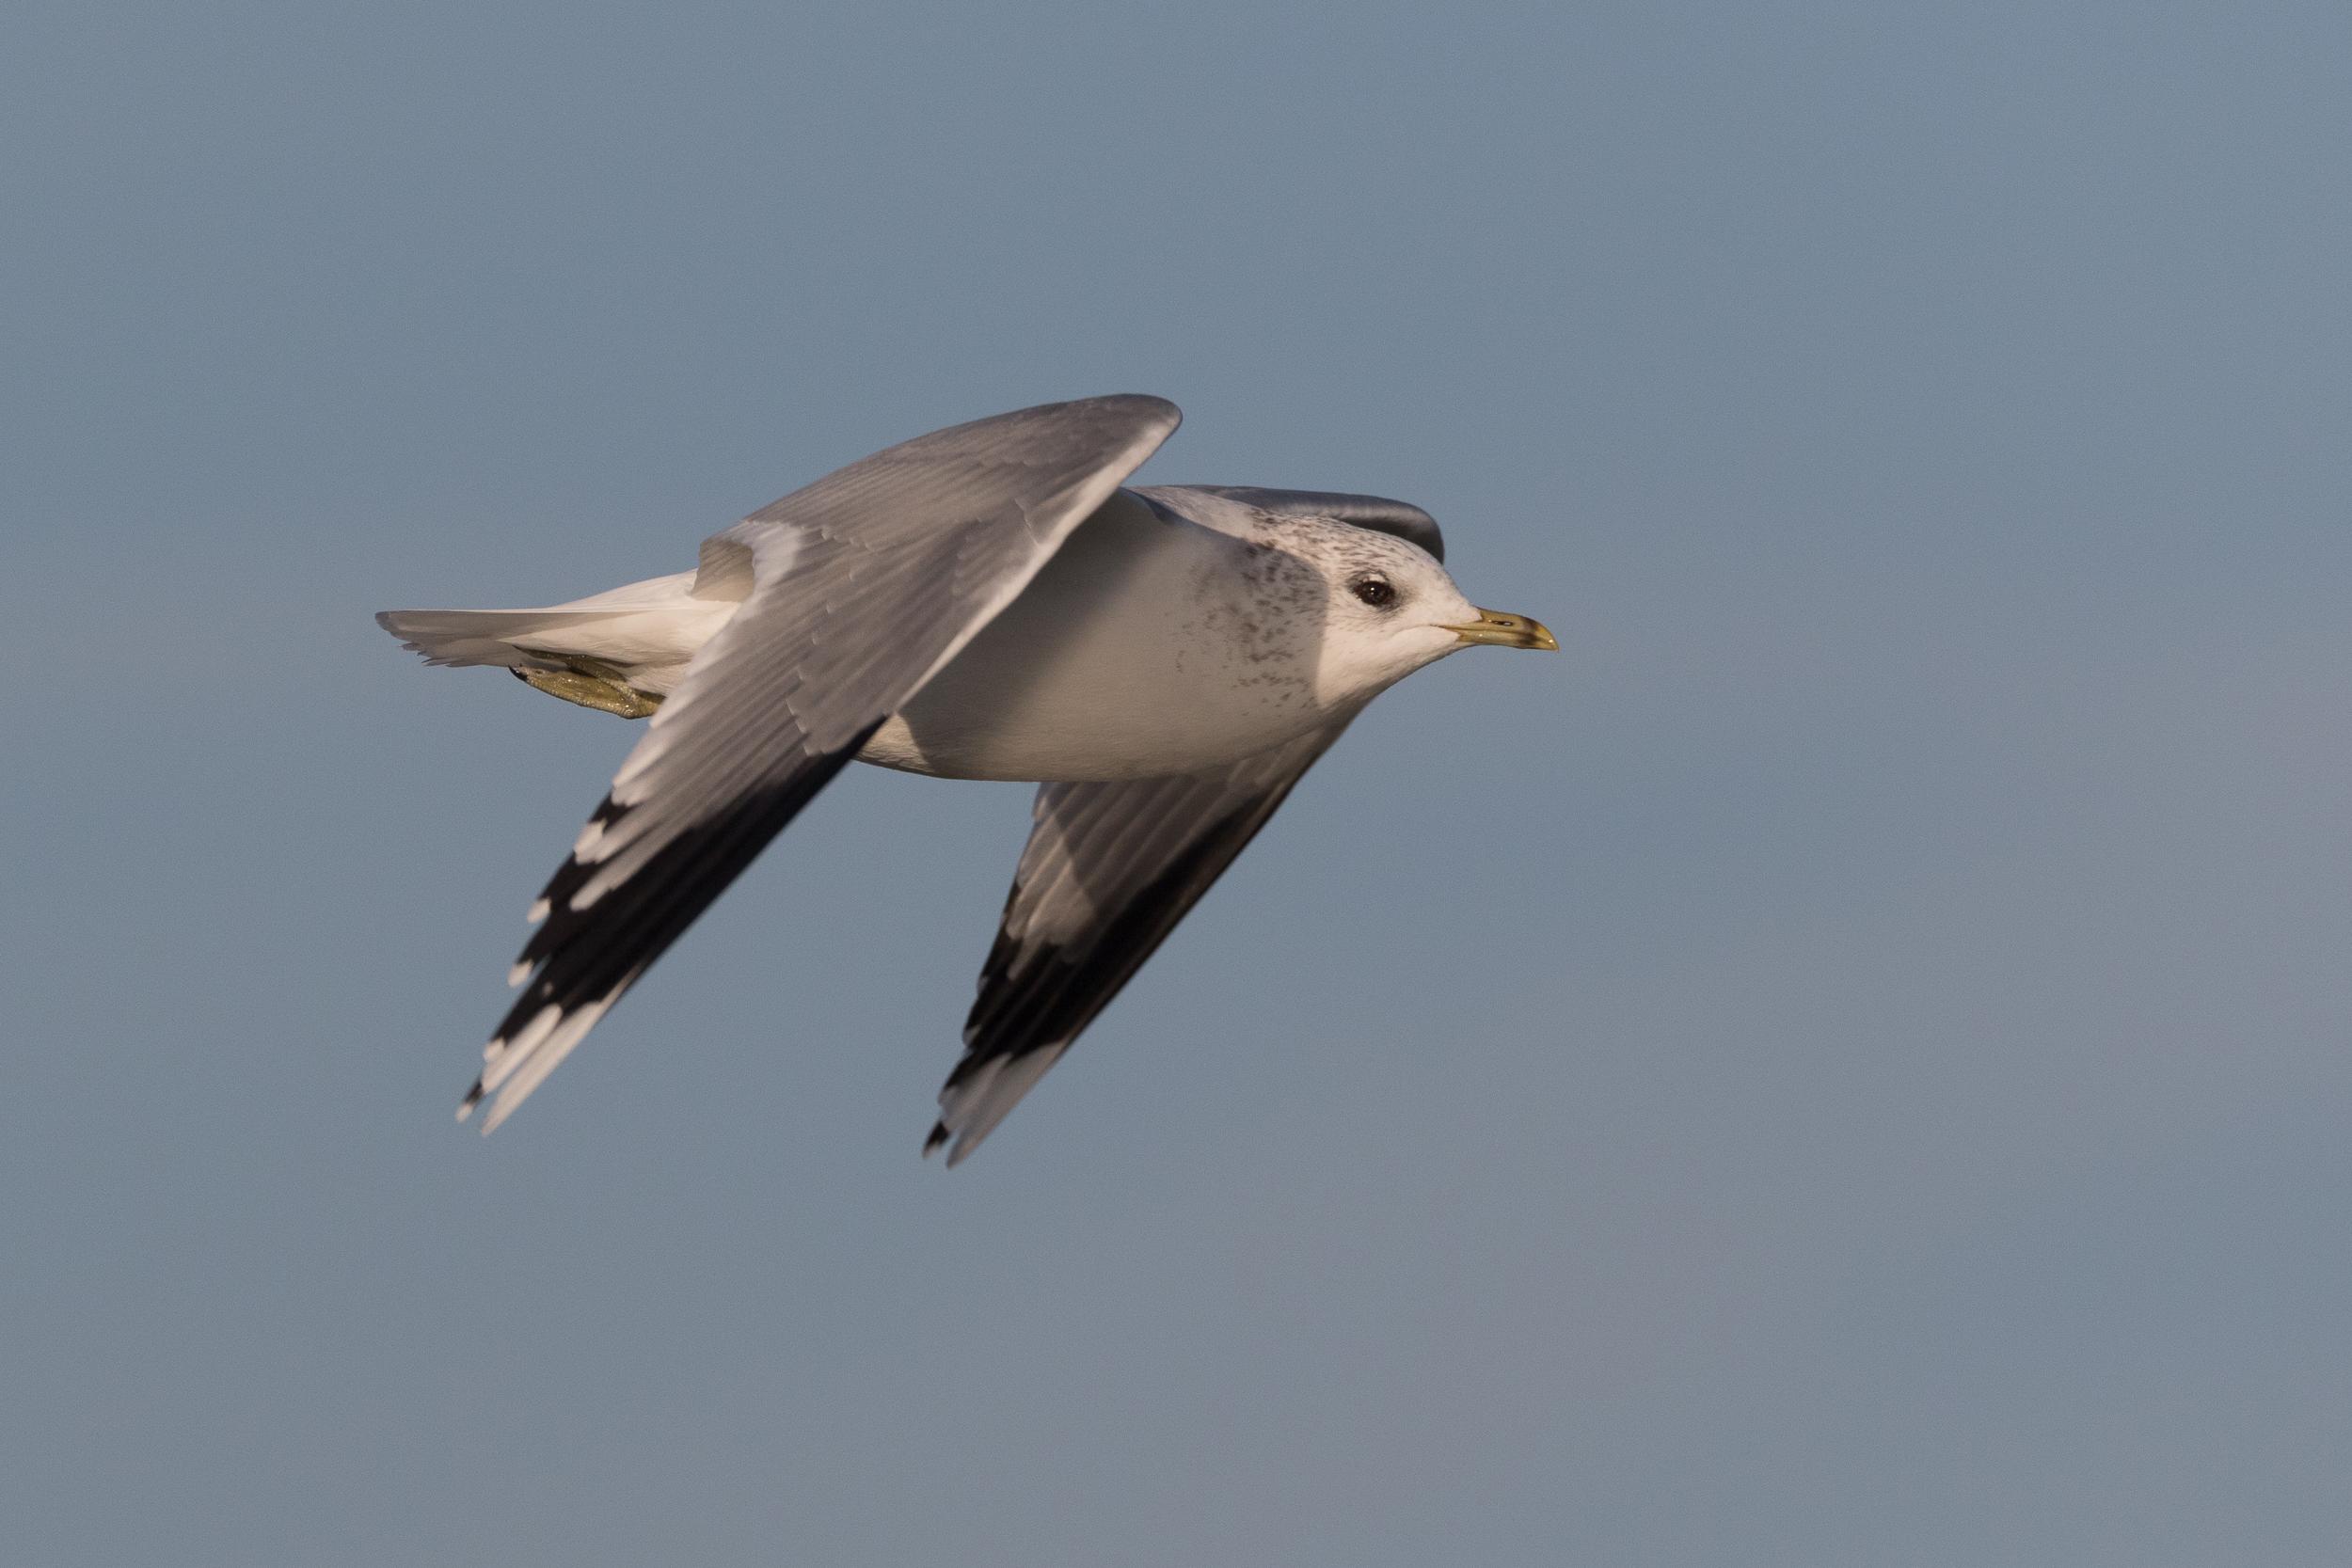 20170121-Common Gull Adult-21.jpg